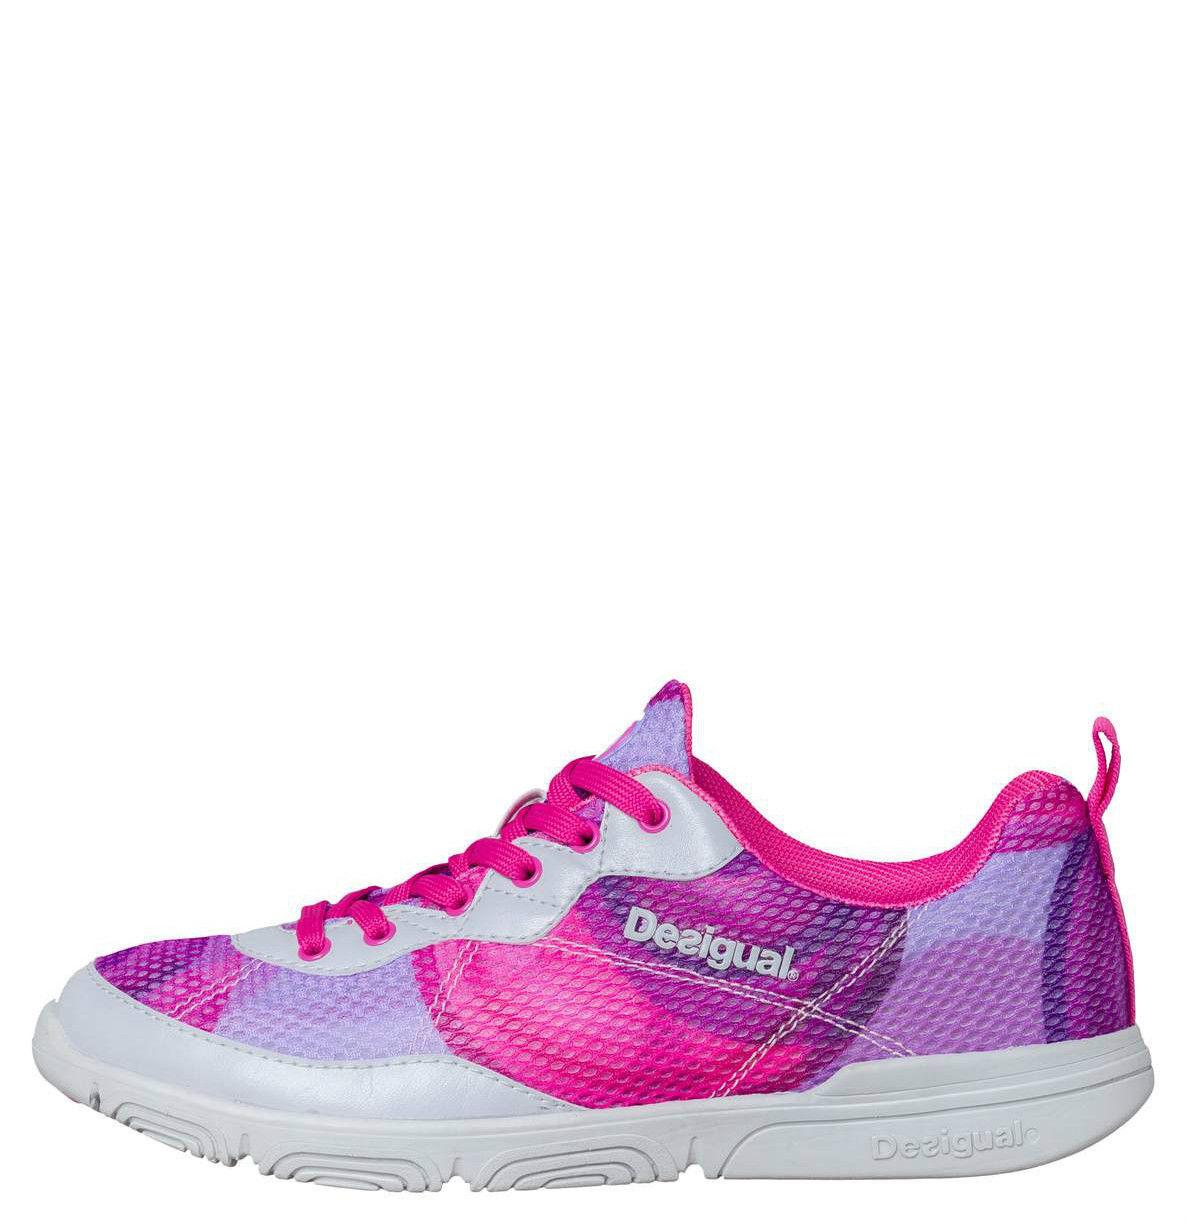 FW16 Fitness Fitness Schuhe Eva T Frau 50DS2A1 3169